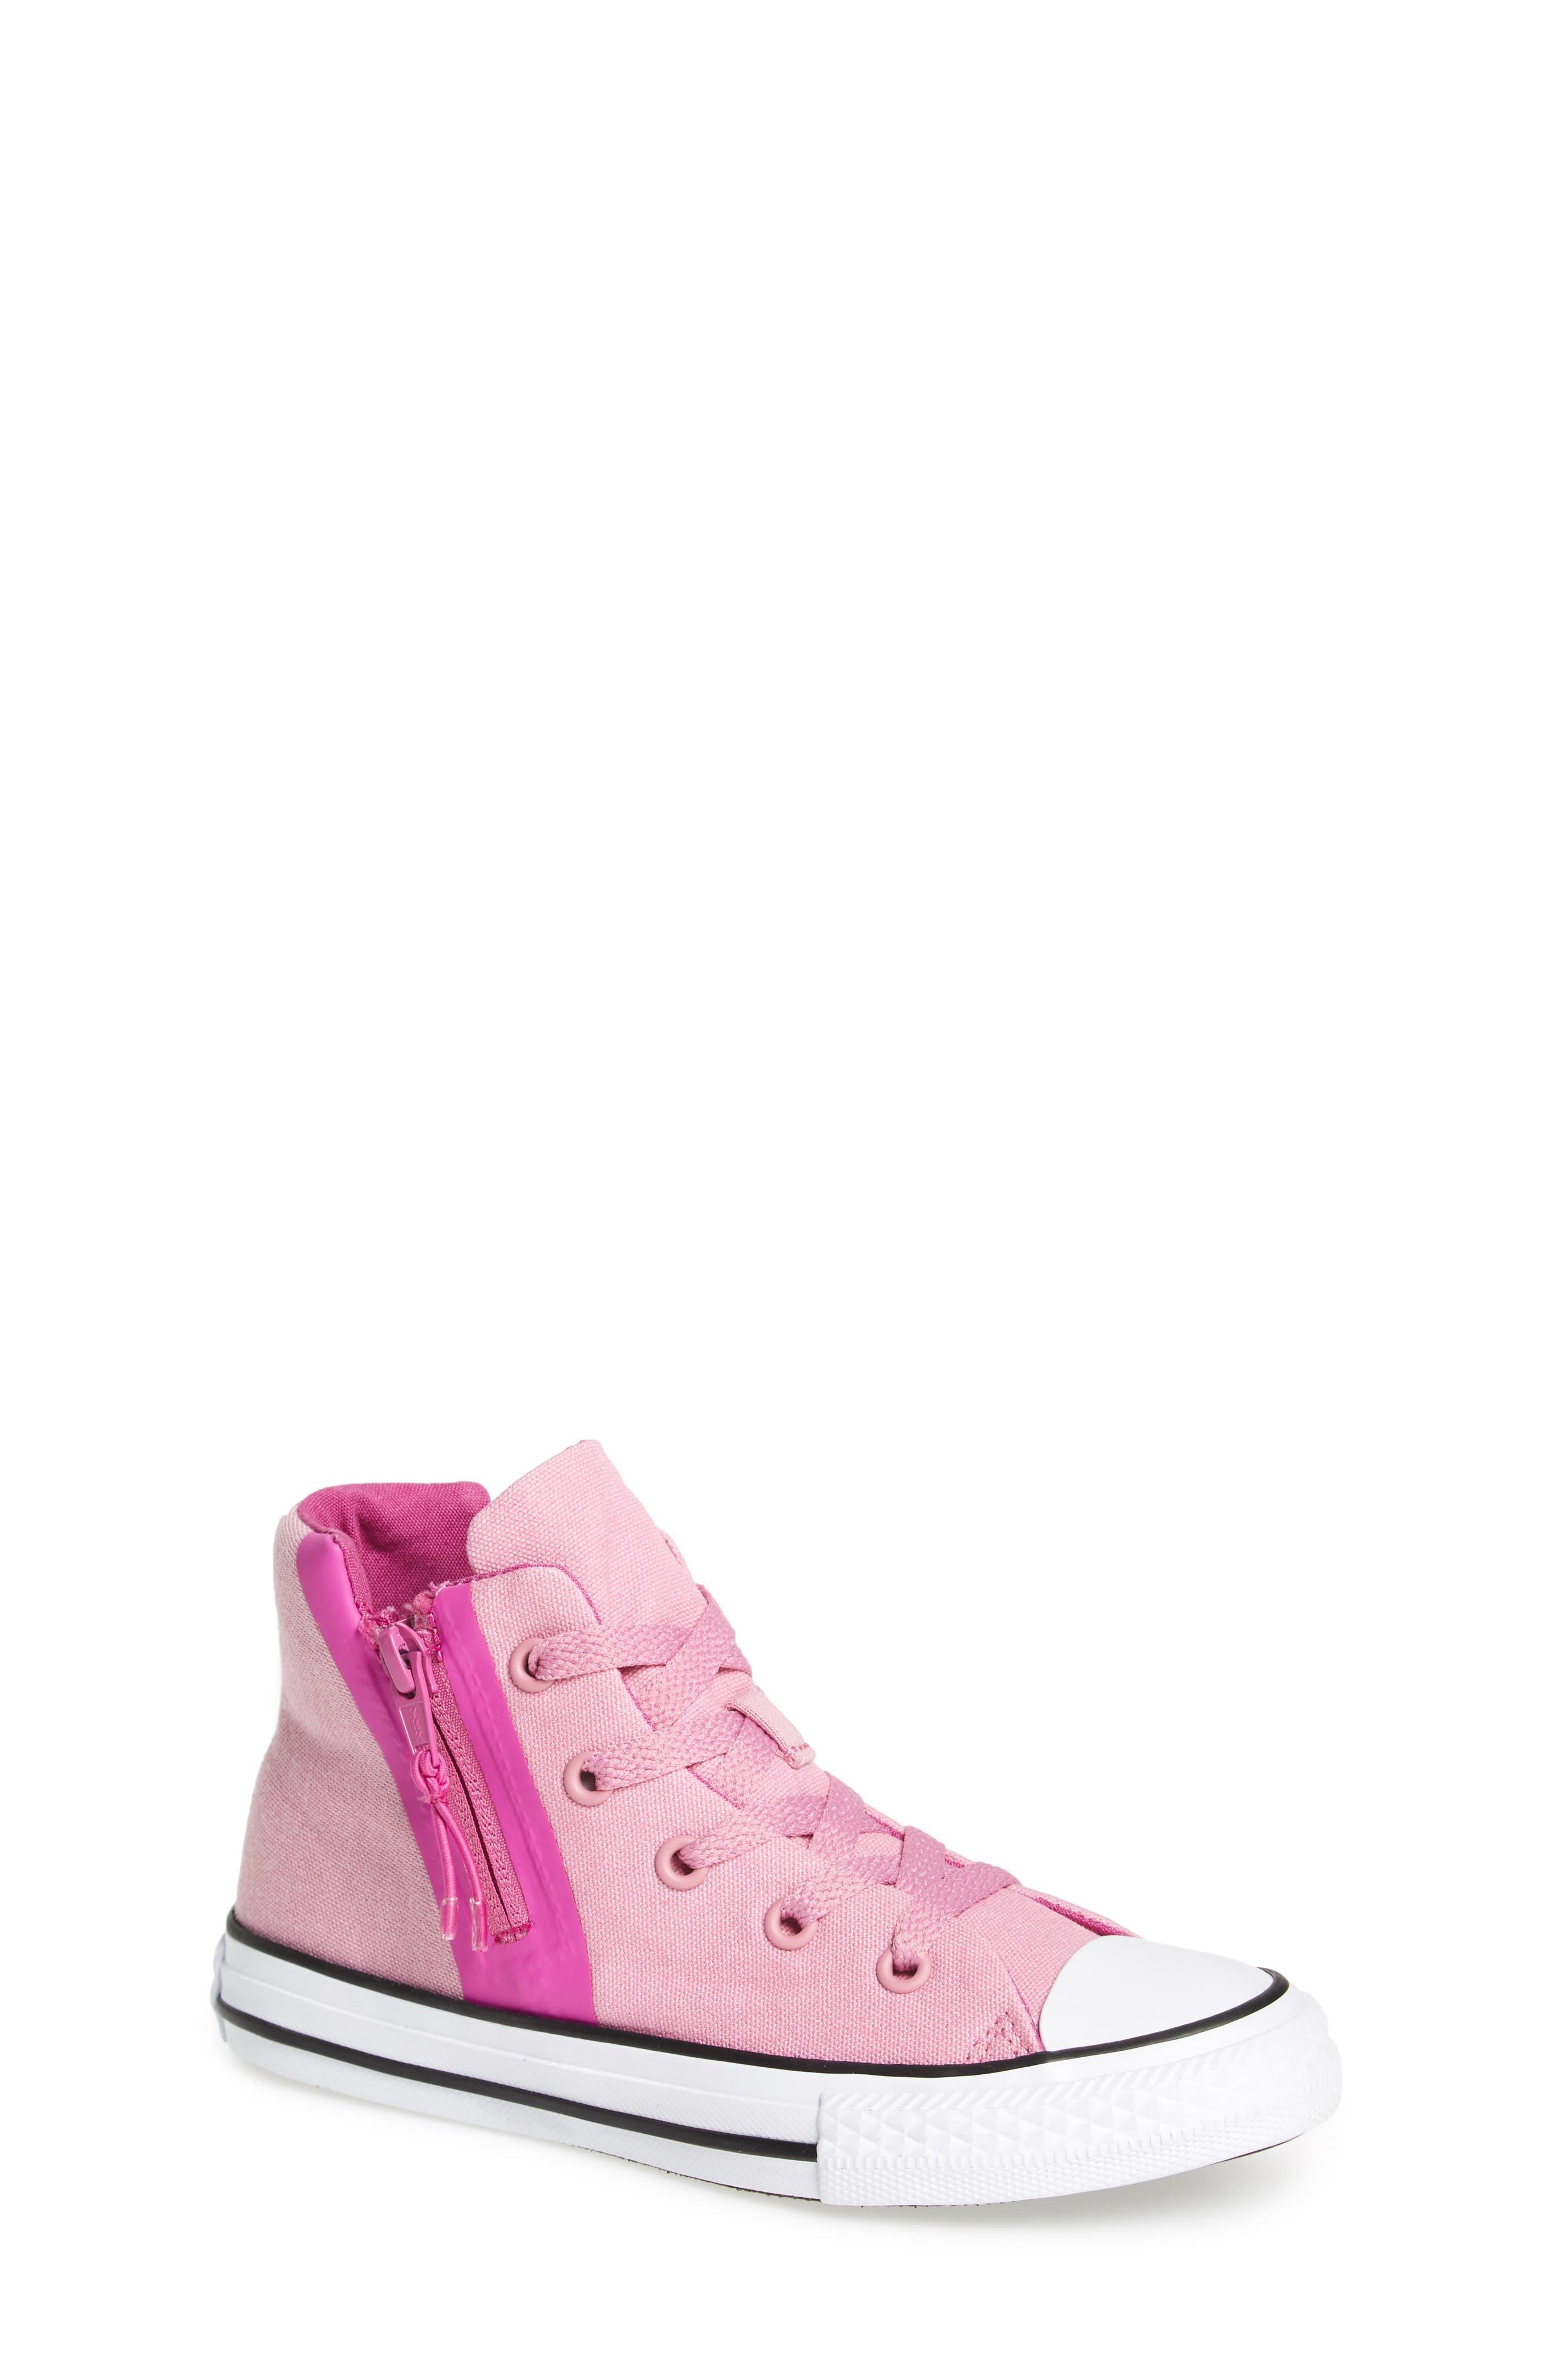 Main Image - Converse Chuck Taylor® All Star® Sport Zip High Top Sneaker (Toddler, Little Kid & Big Kid)